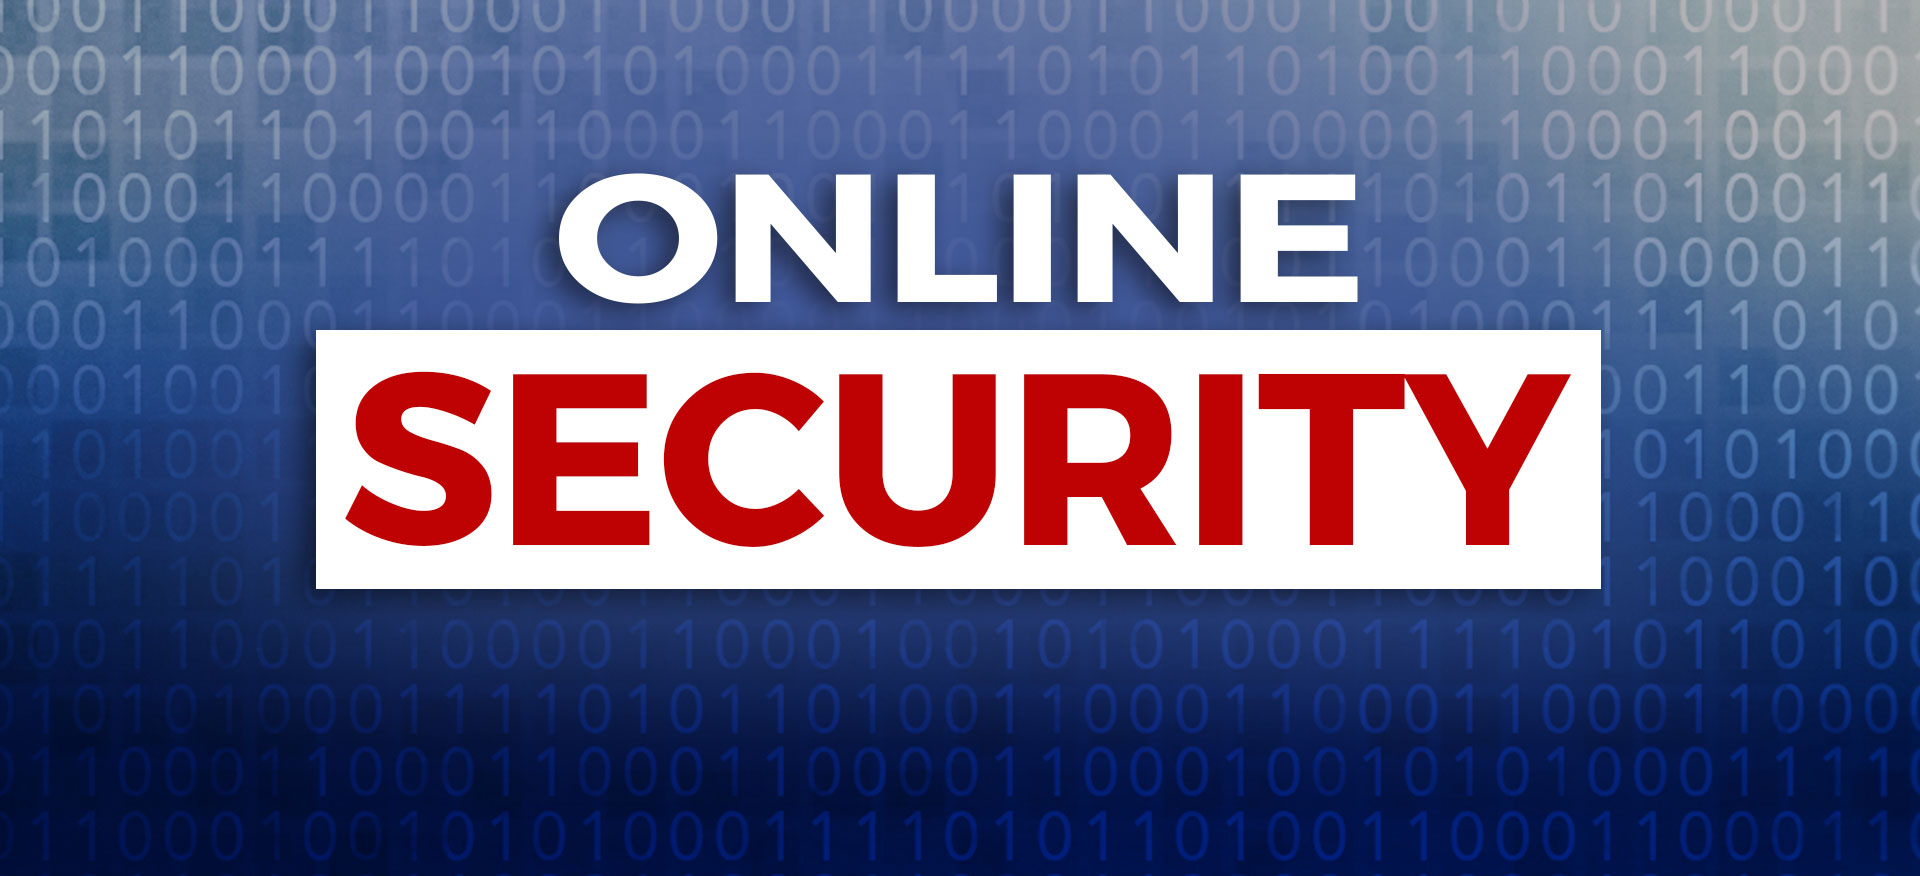 Online Security Cyber Security Digital Attacks Hacking Hackers Hack